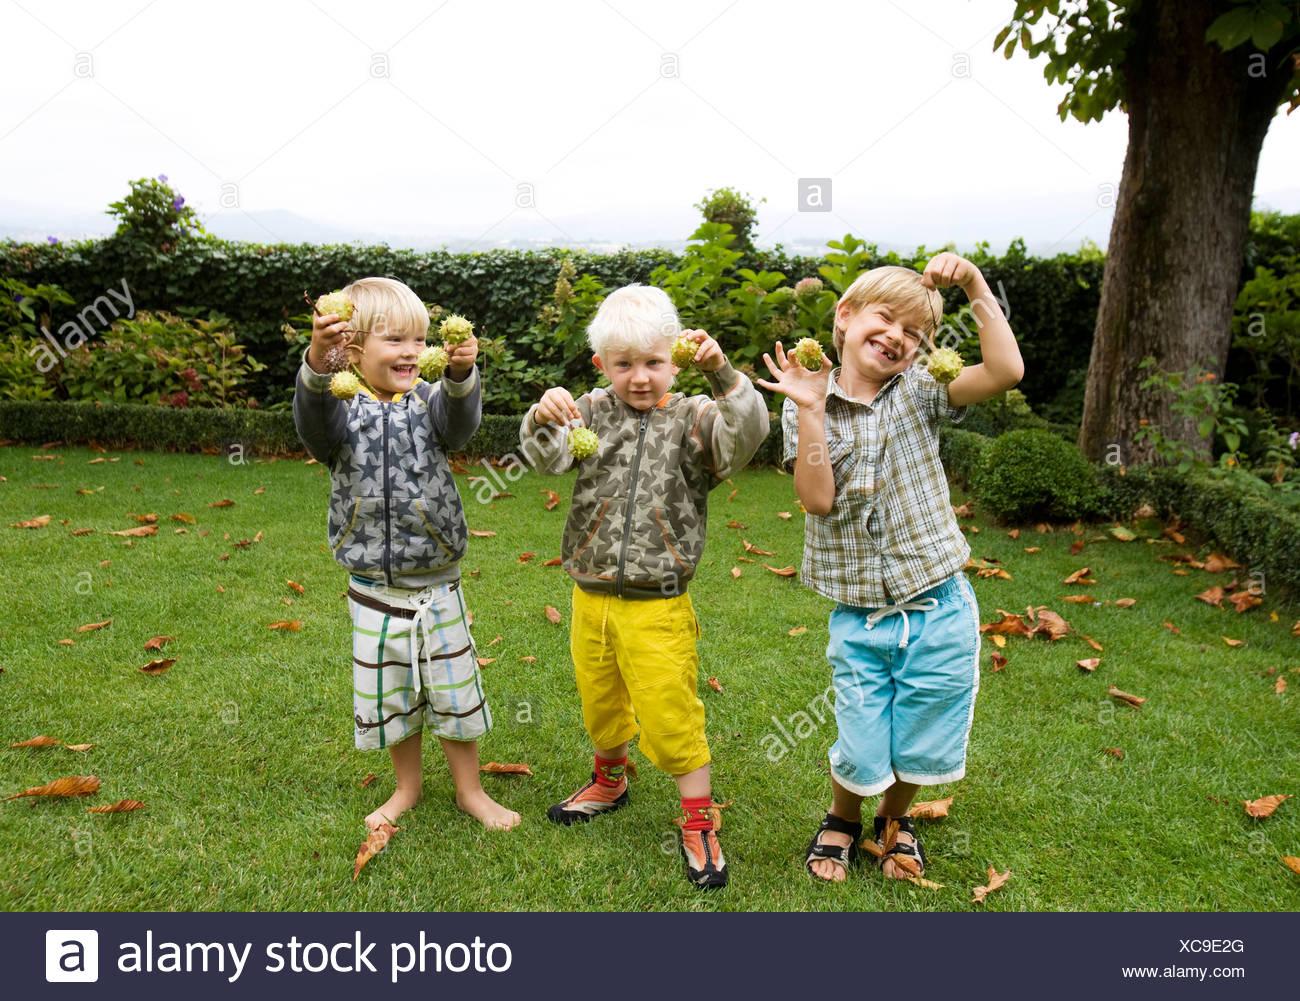 3 boys portrait - Stock Image